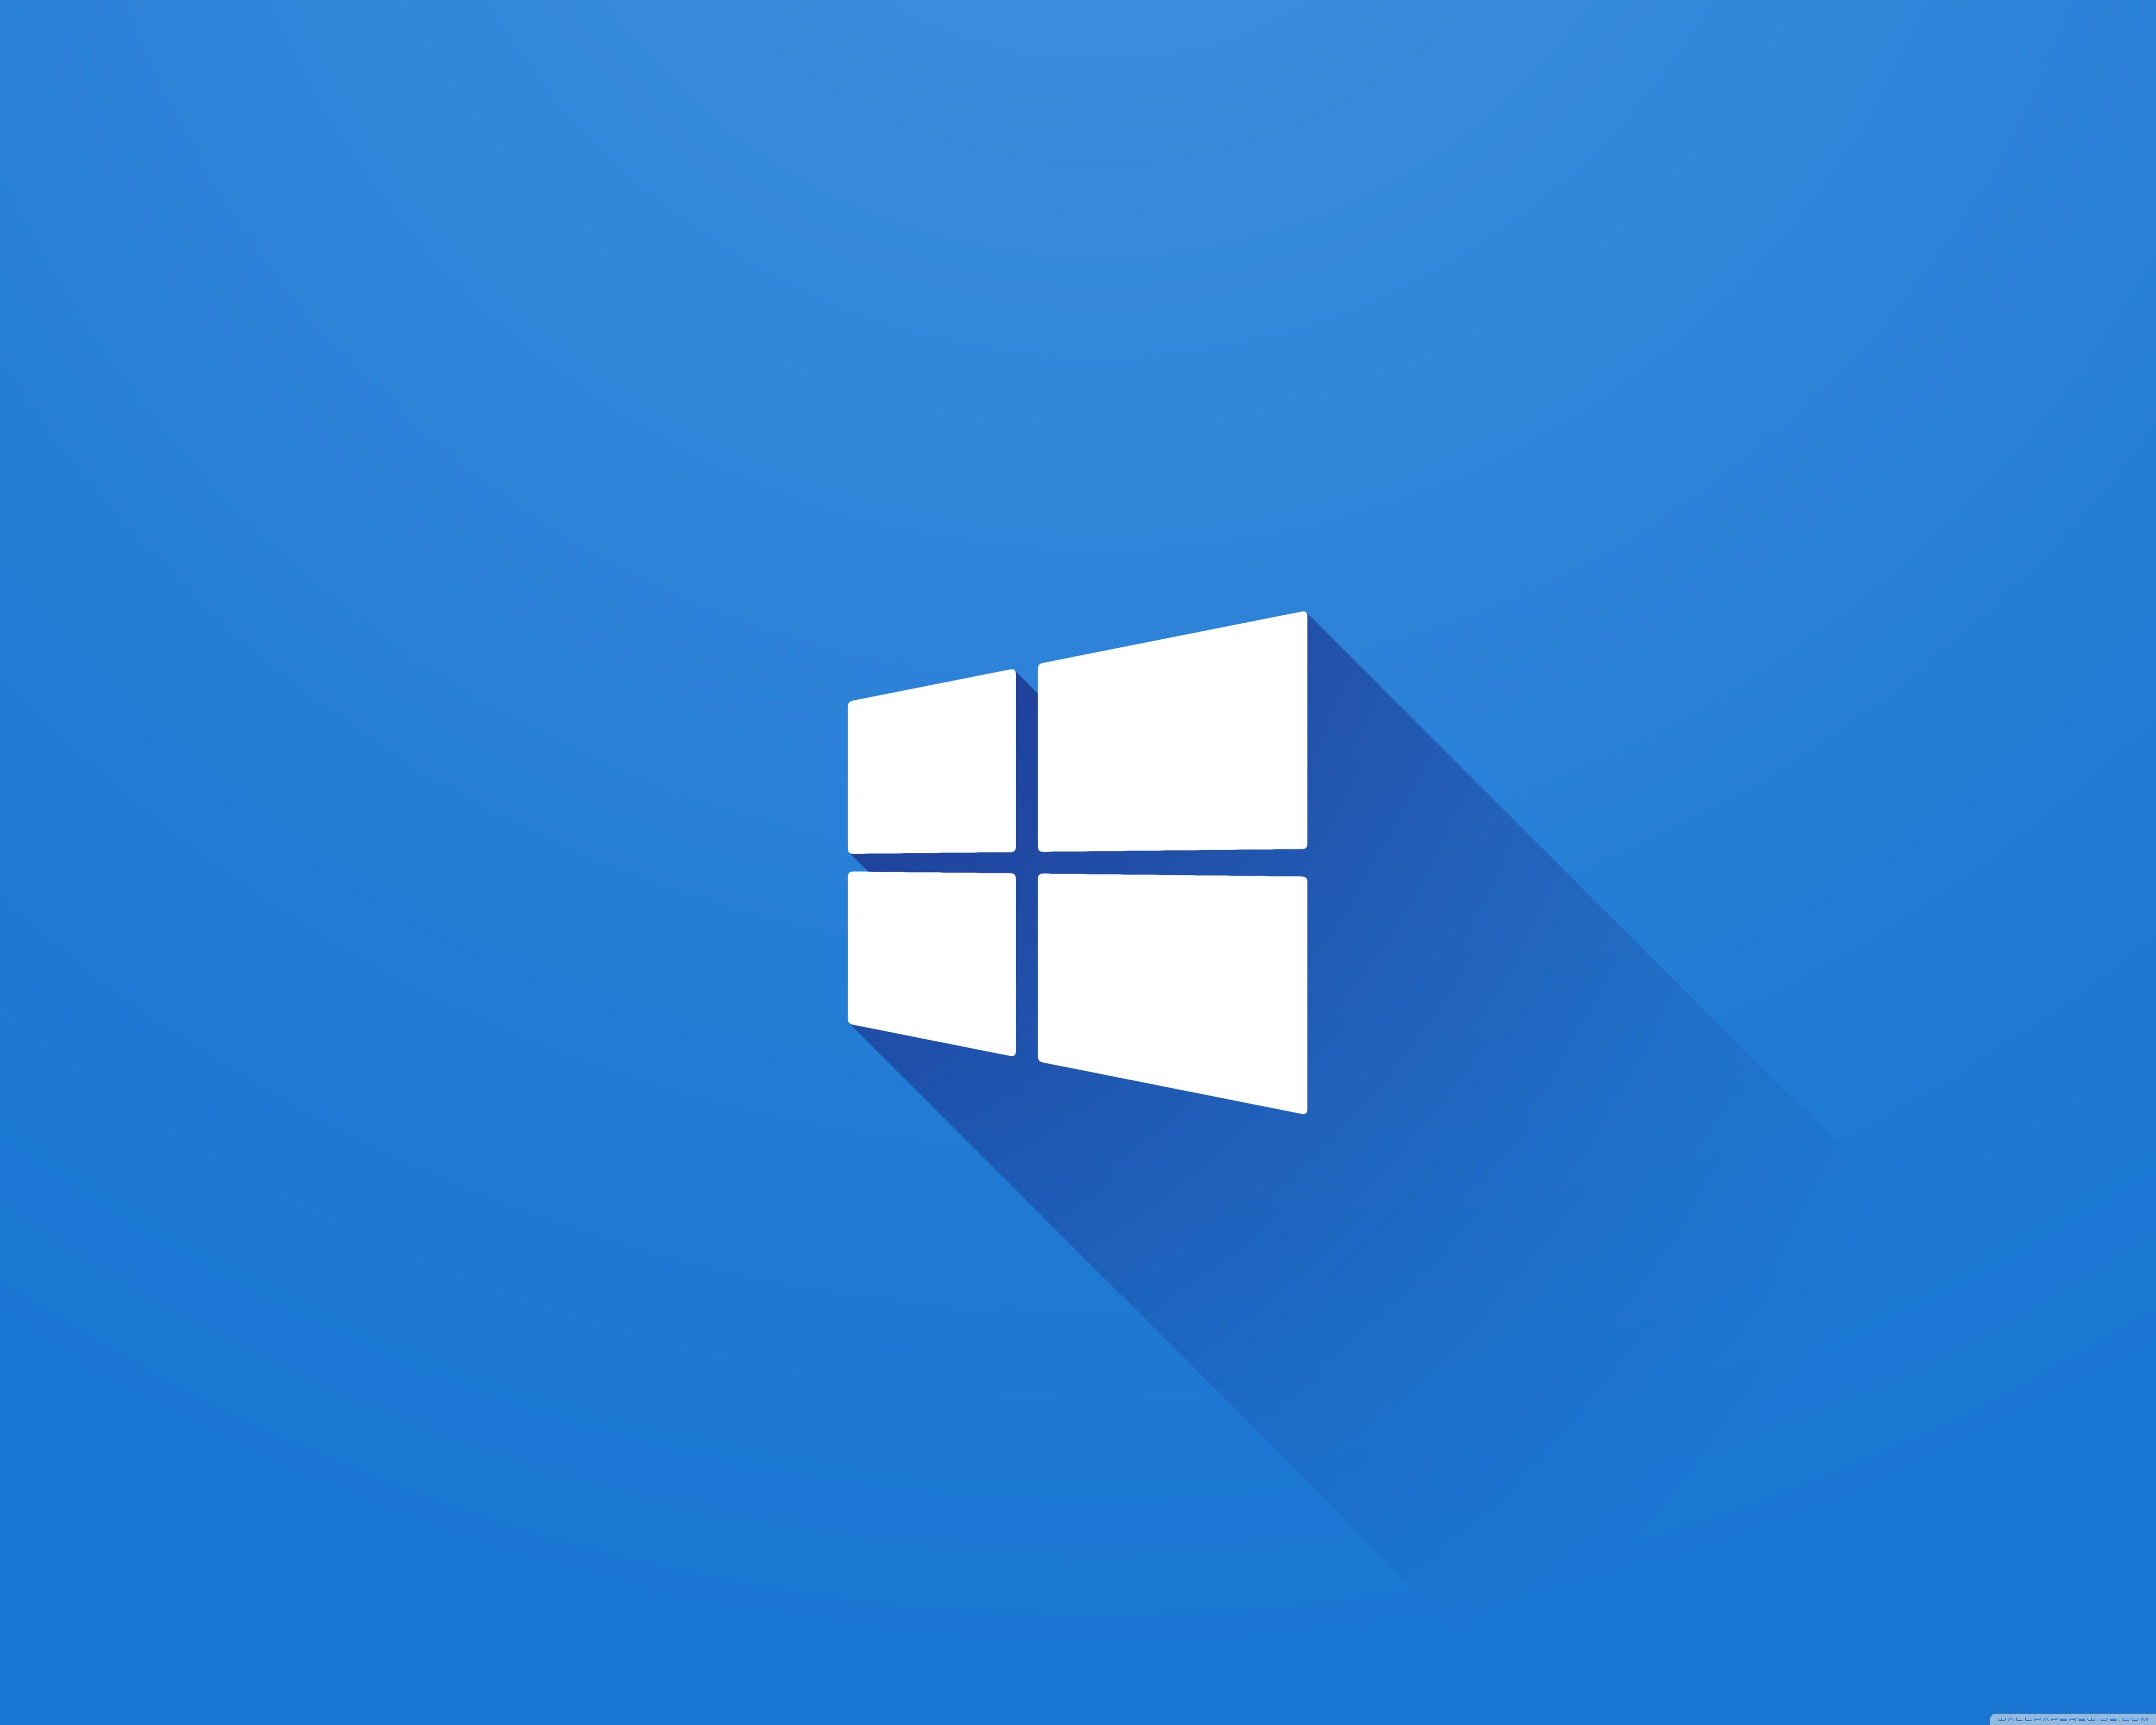 WallpapersWide.com Windows HD Desktop Wallpapers for 4K